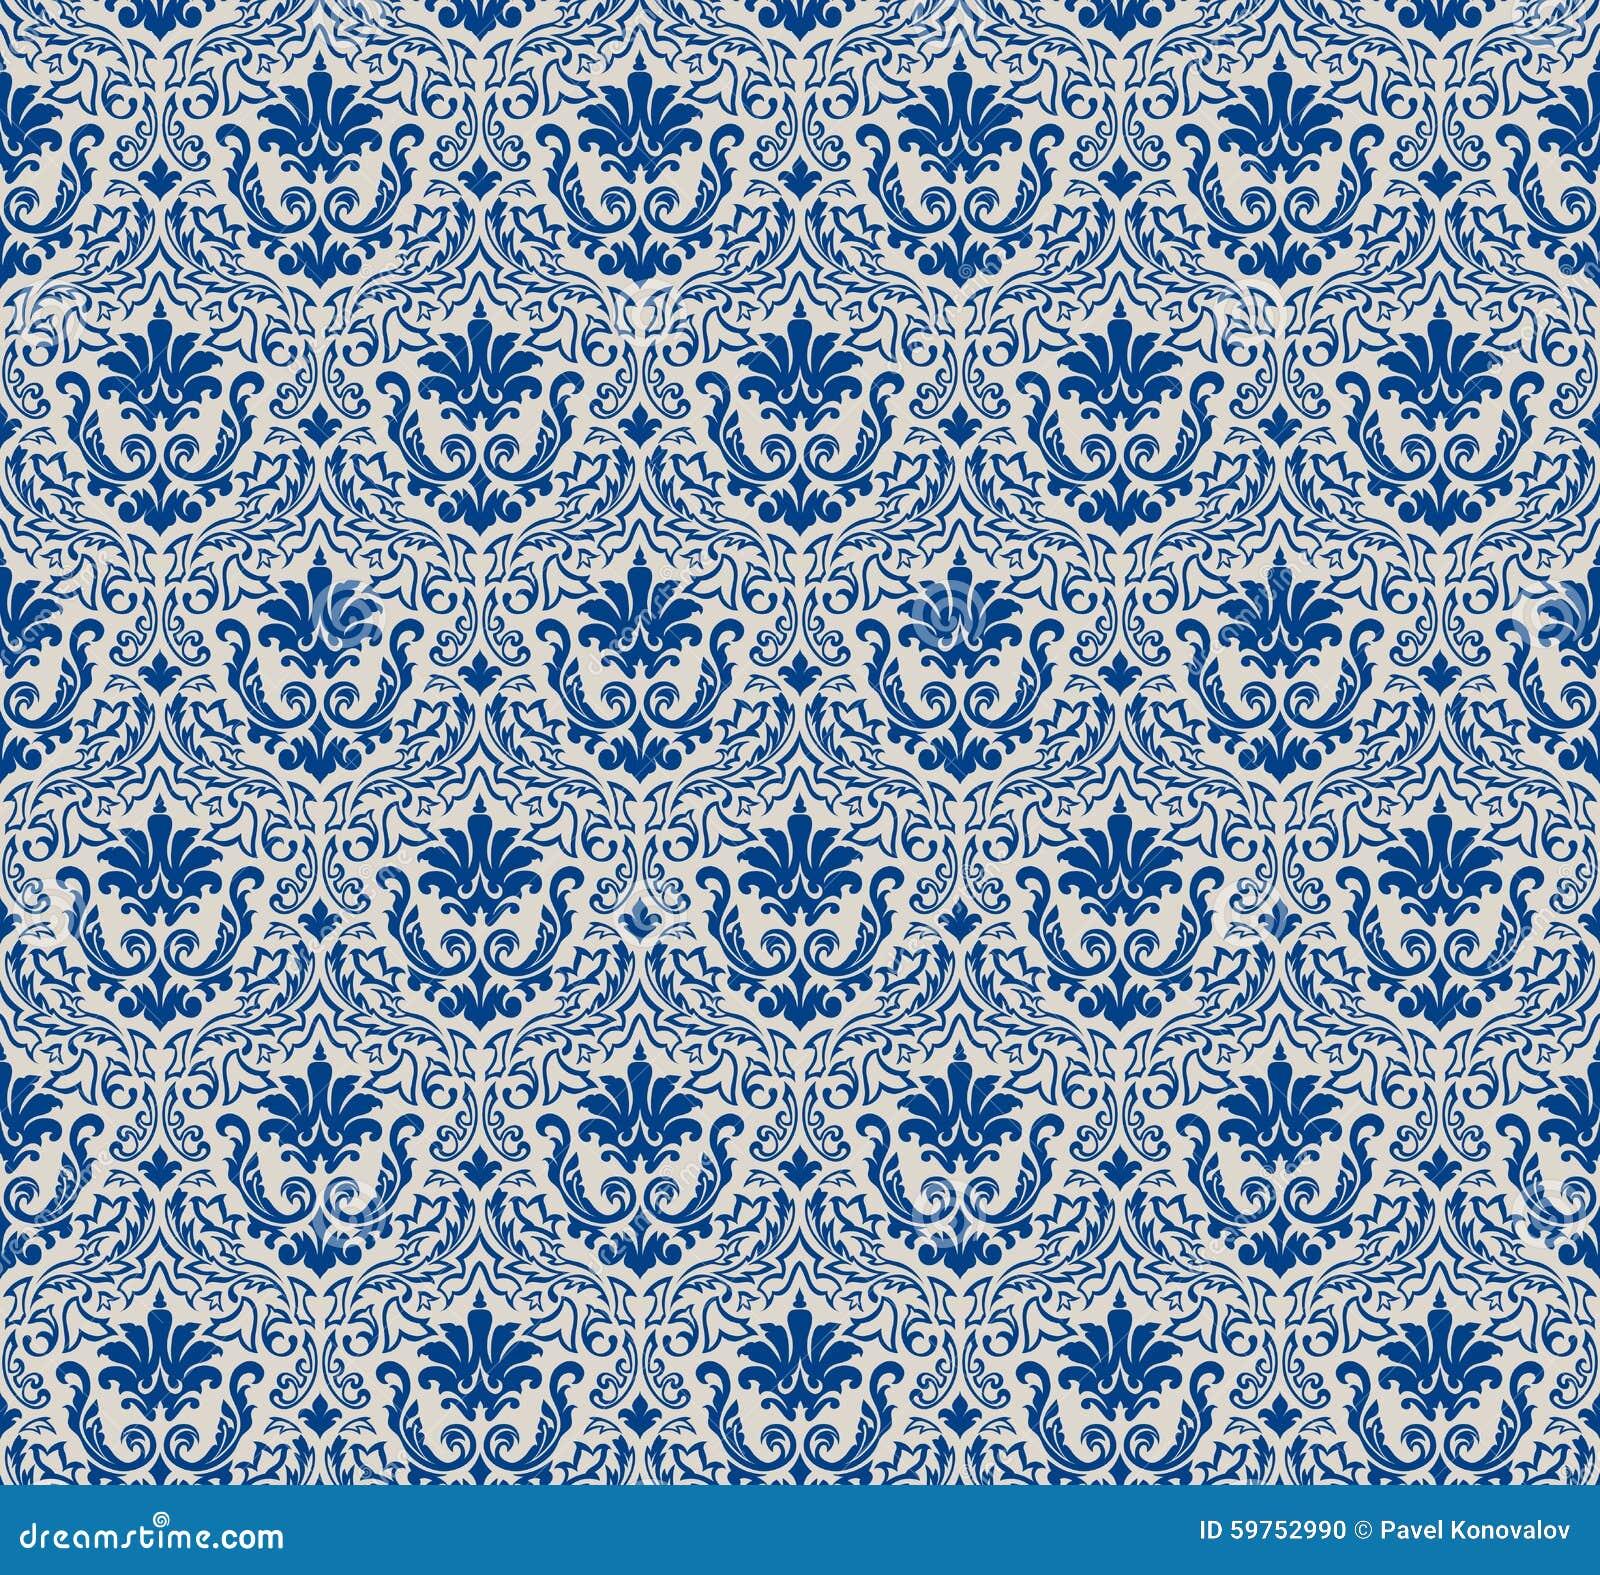 swirling royal pattern wallpaper - photo #18